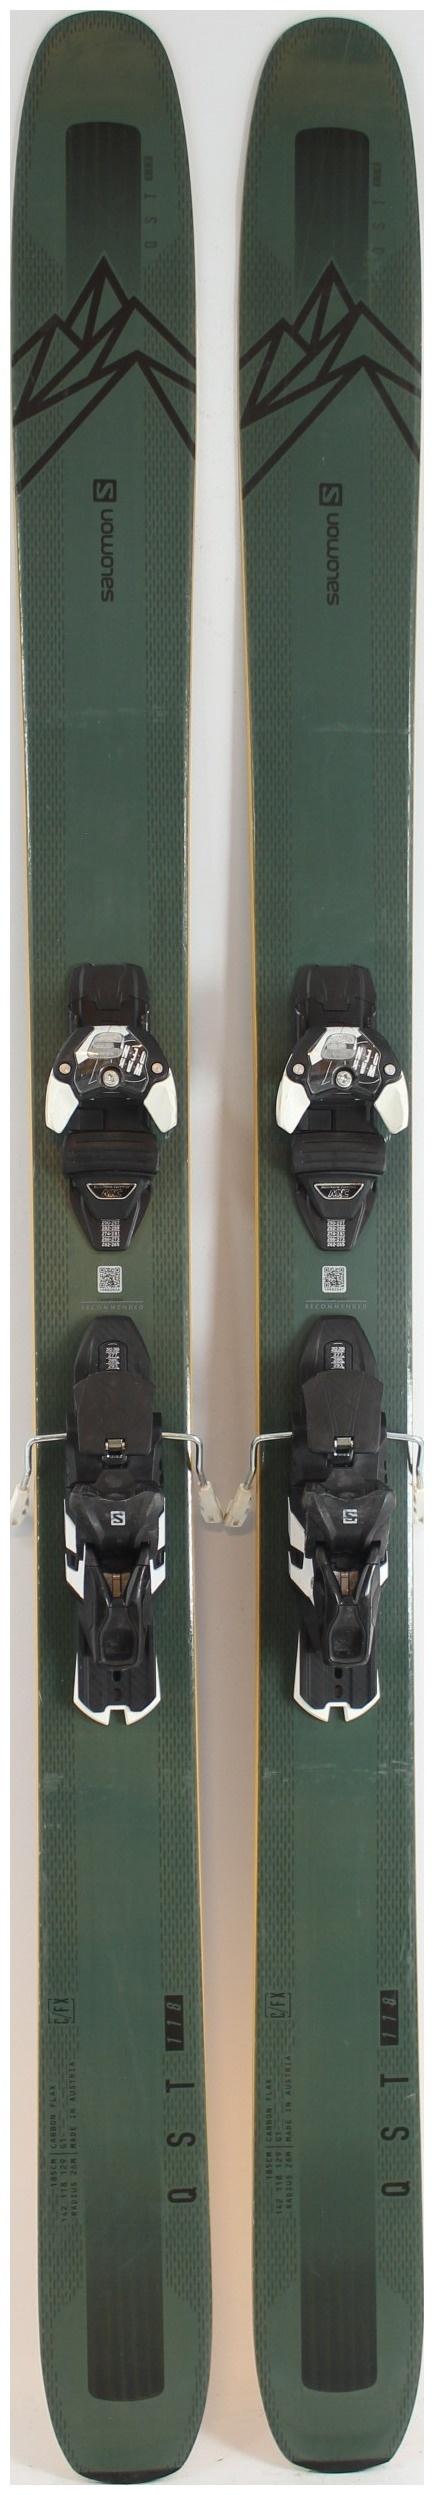 2019, Salomon, QST 92 Skis with Salomon Warden MNC 13 Demo Bindings Used Demo Skis 185cm